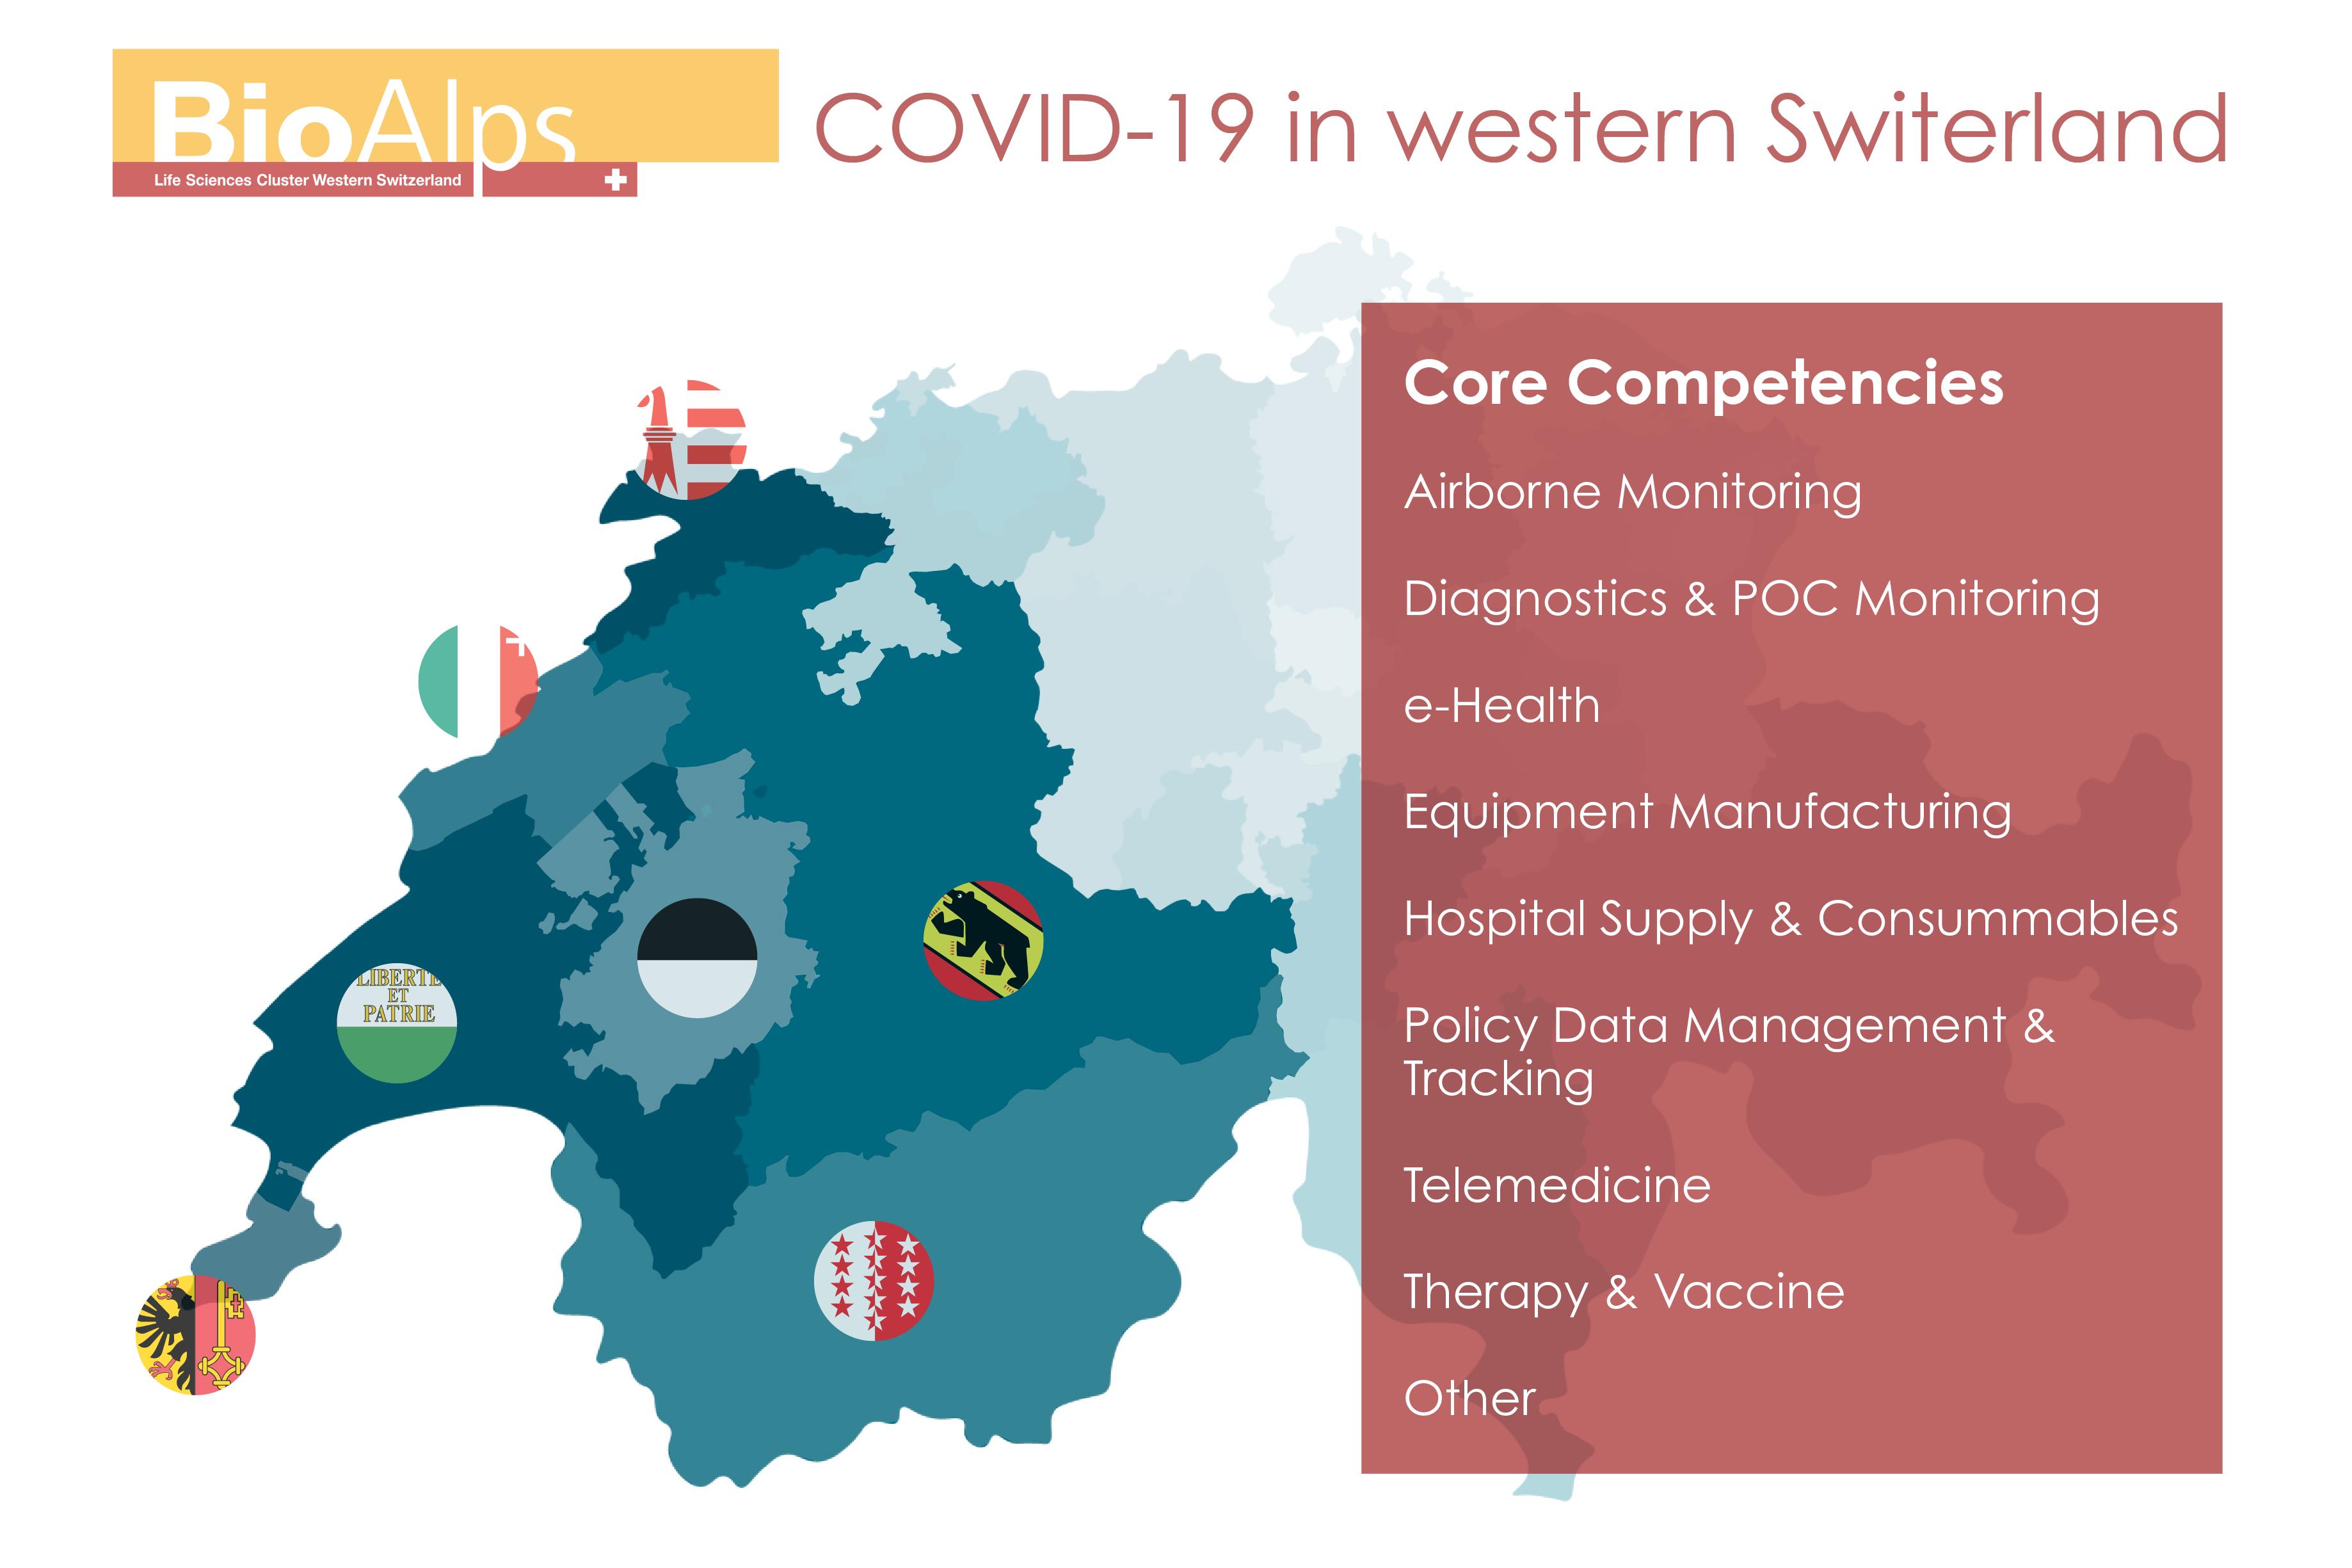 BioAlps COVID-19